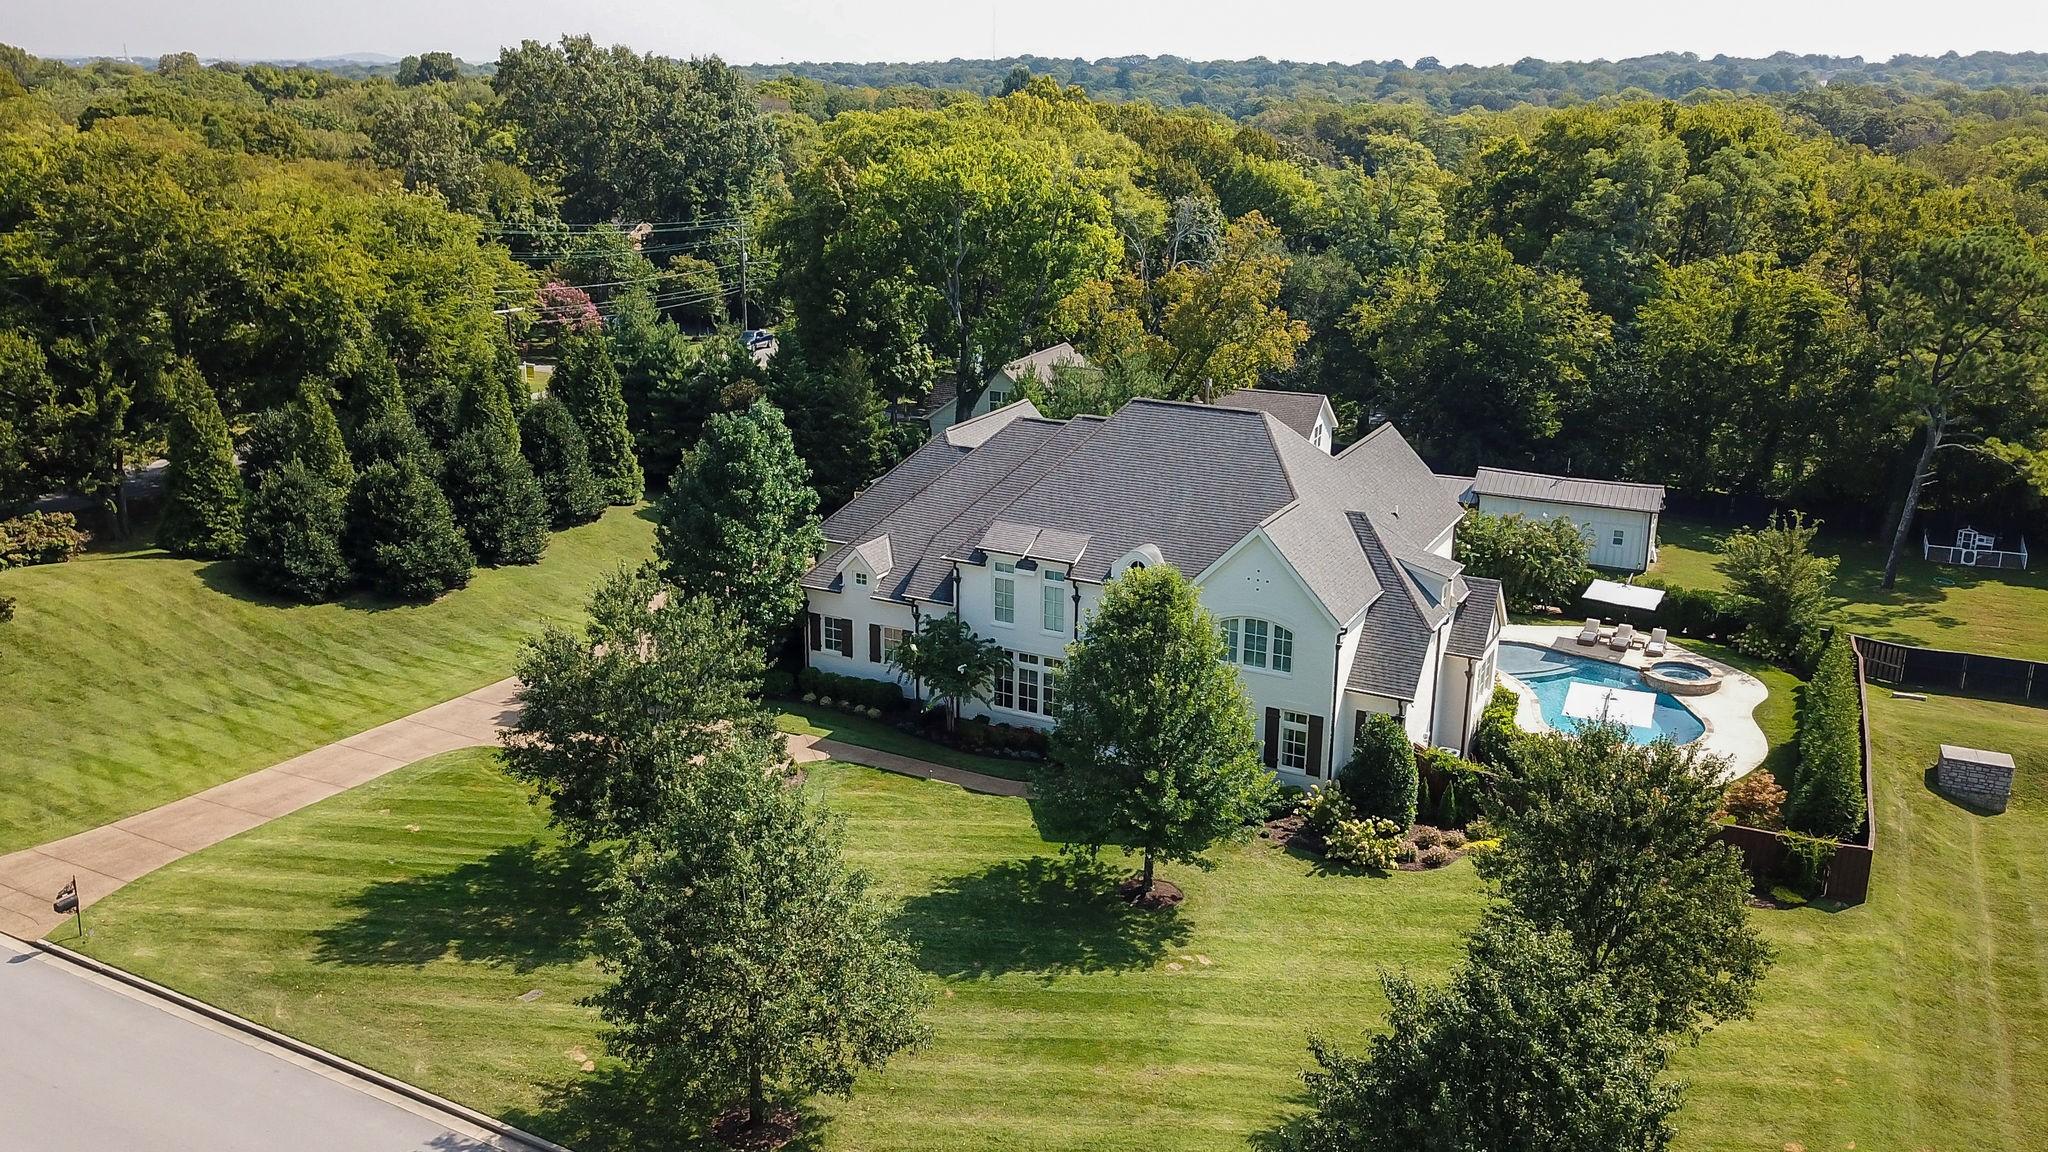 104 Loring Ct, Nashville, TN 37220 - Nashville, TN real estate listing